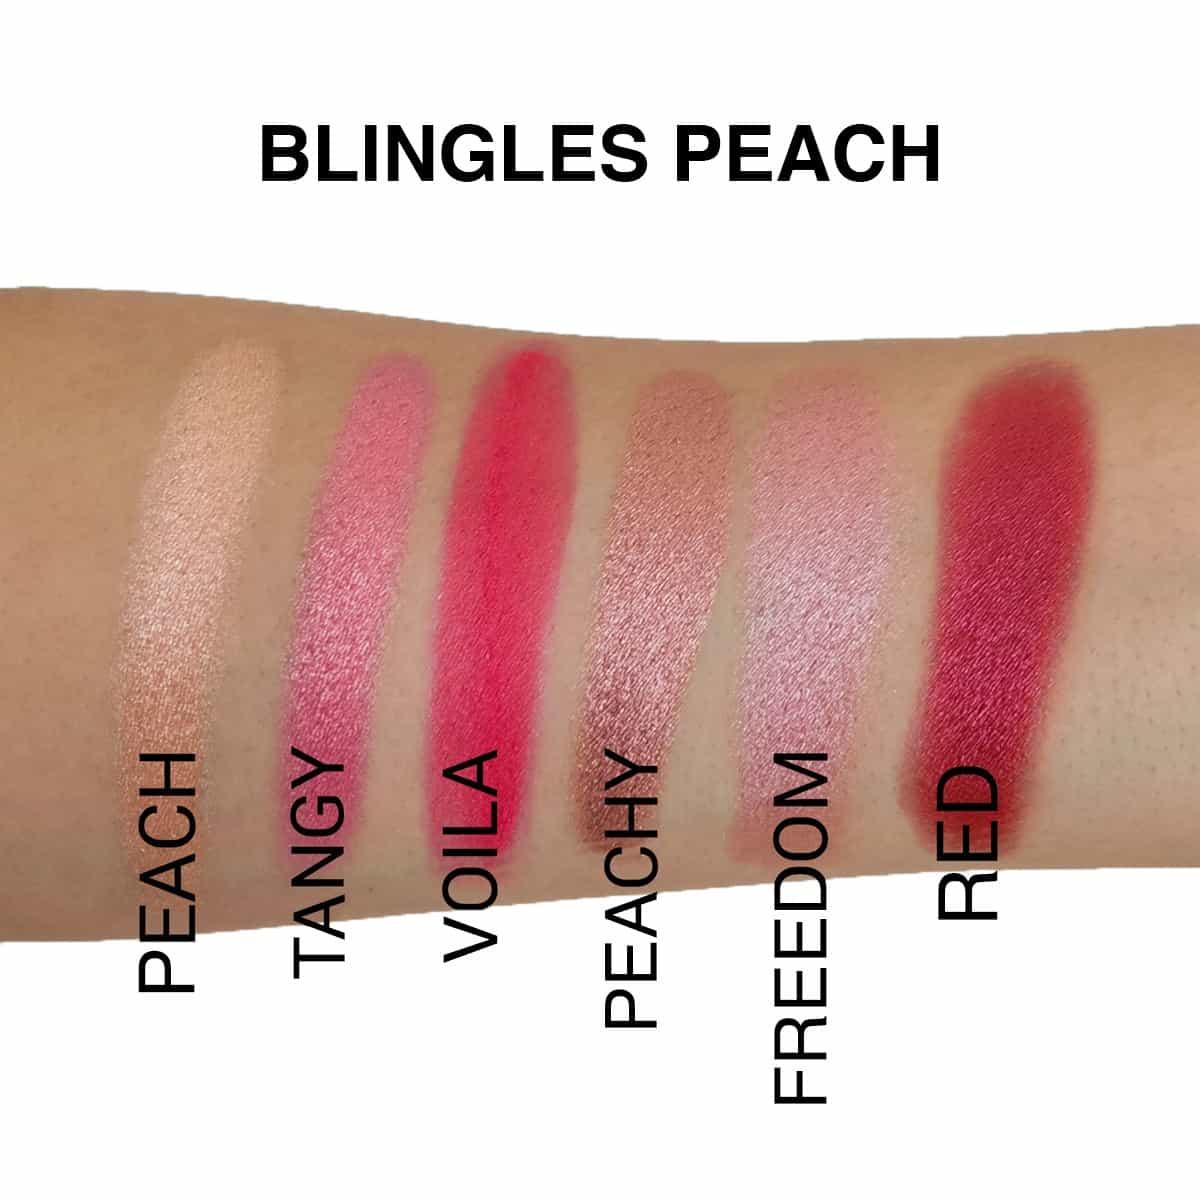 Blingles-Peach